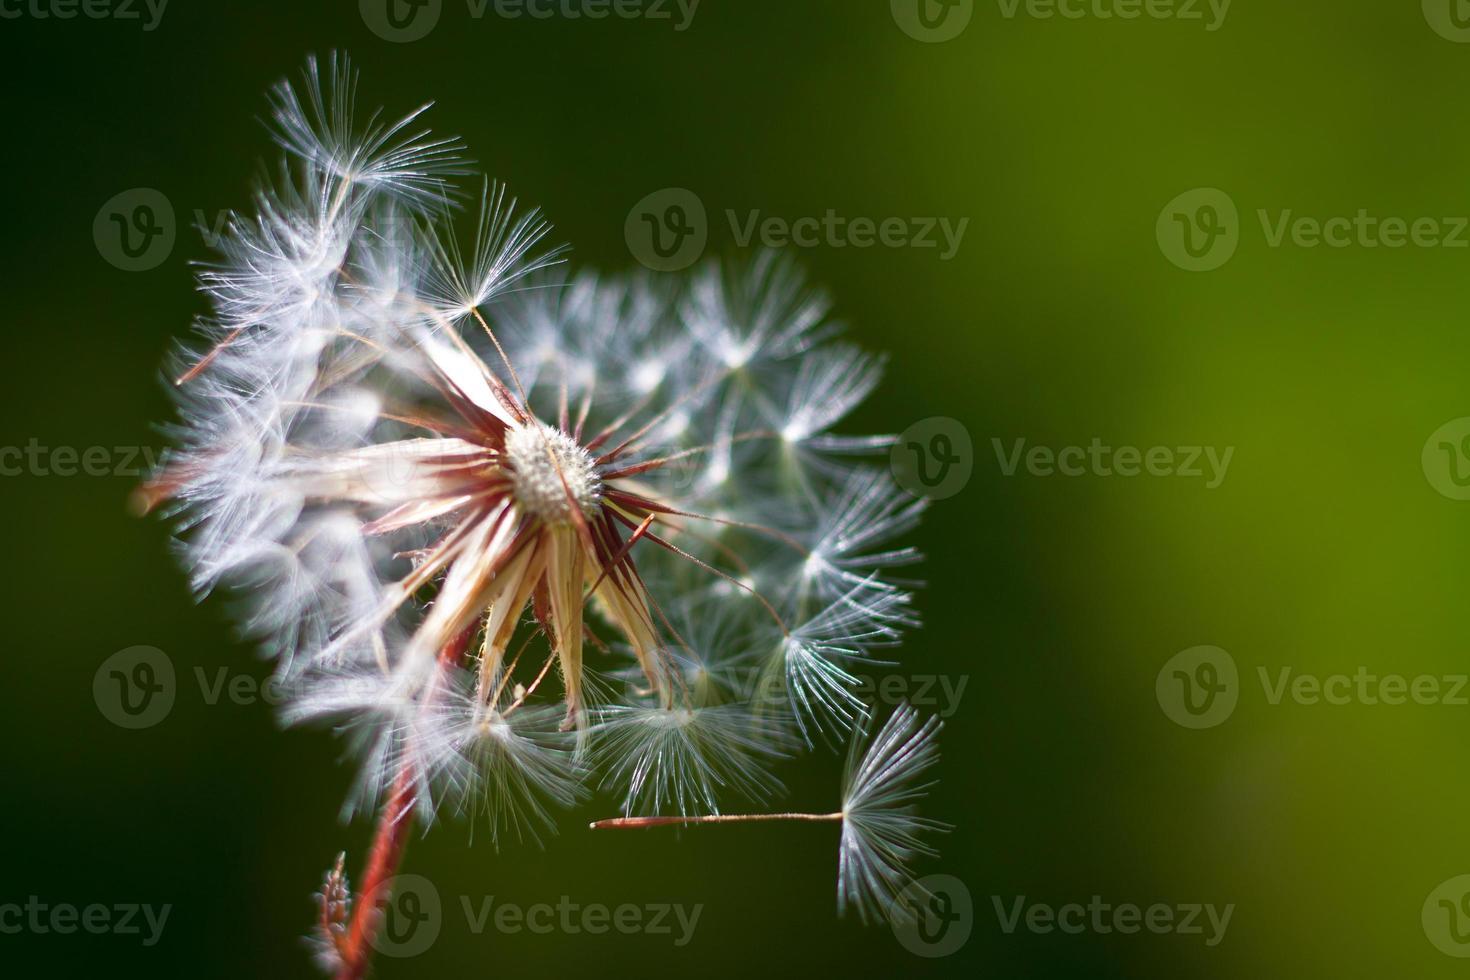 Dandelion flower. Close-up photo